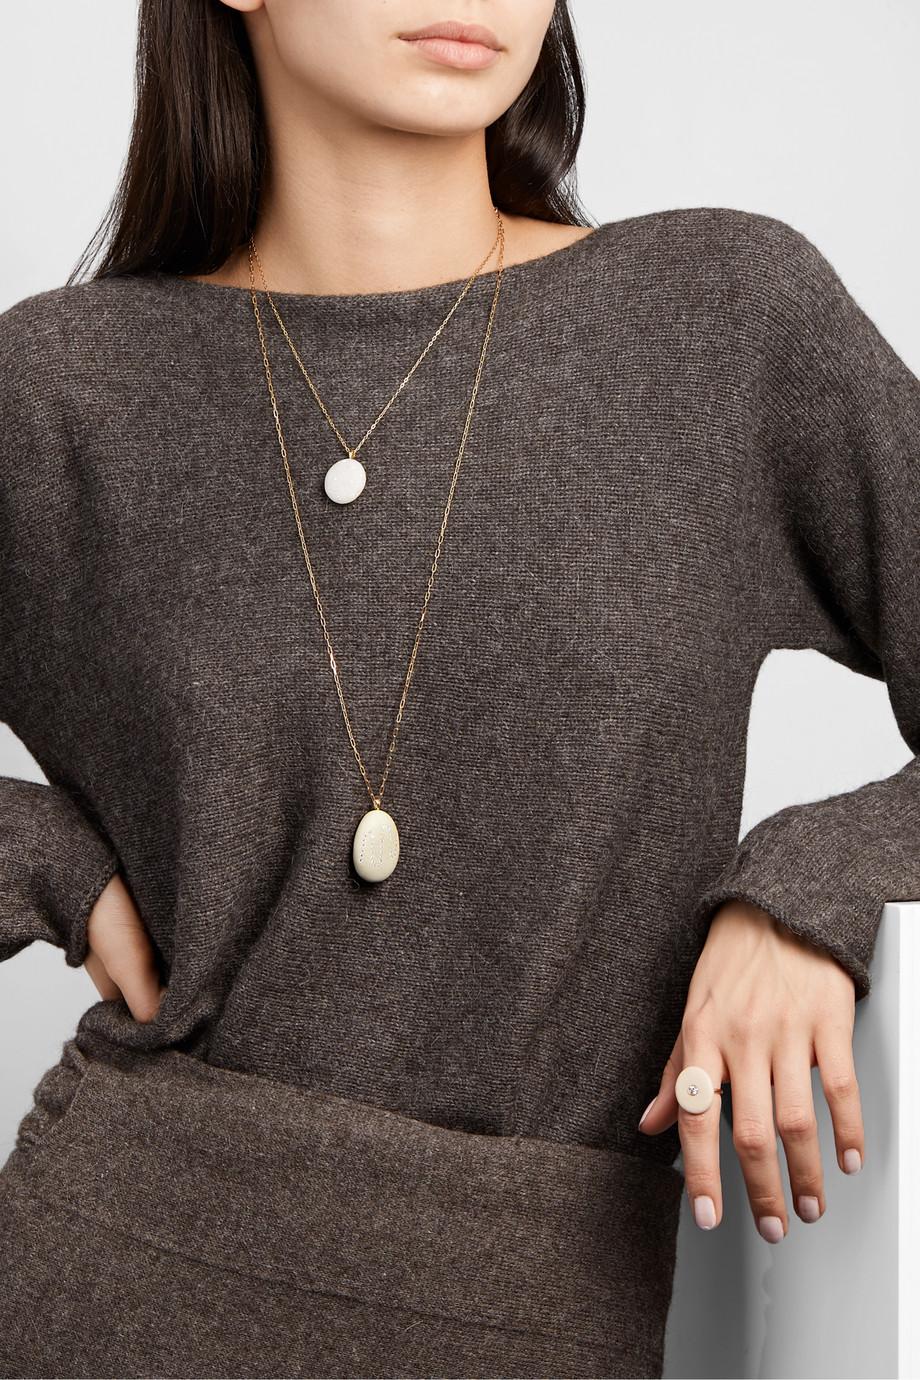 CVC Stones Billowing 18-karat gold, stone and diamond necklace